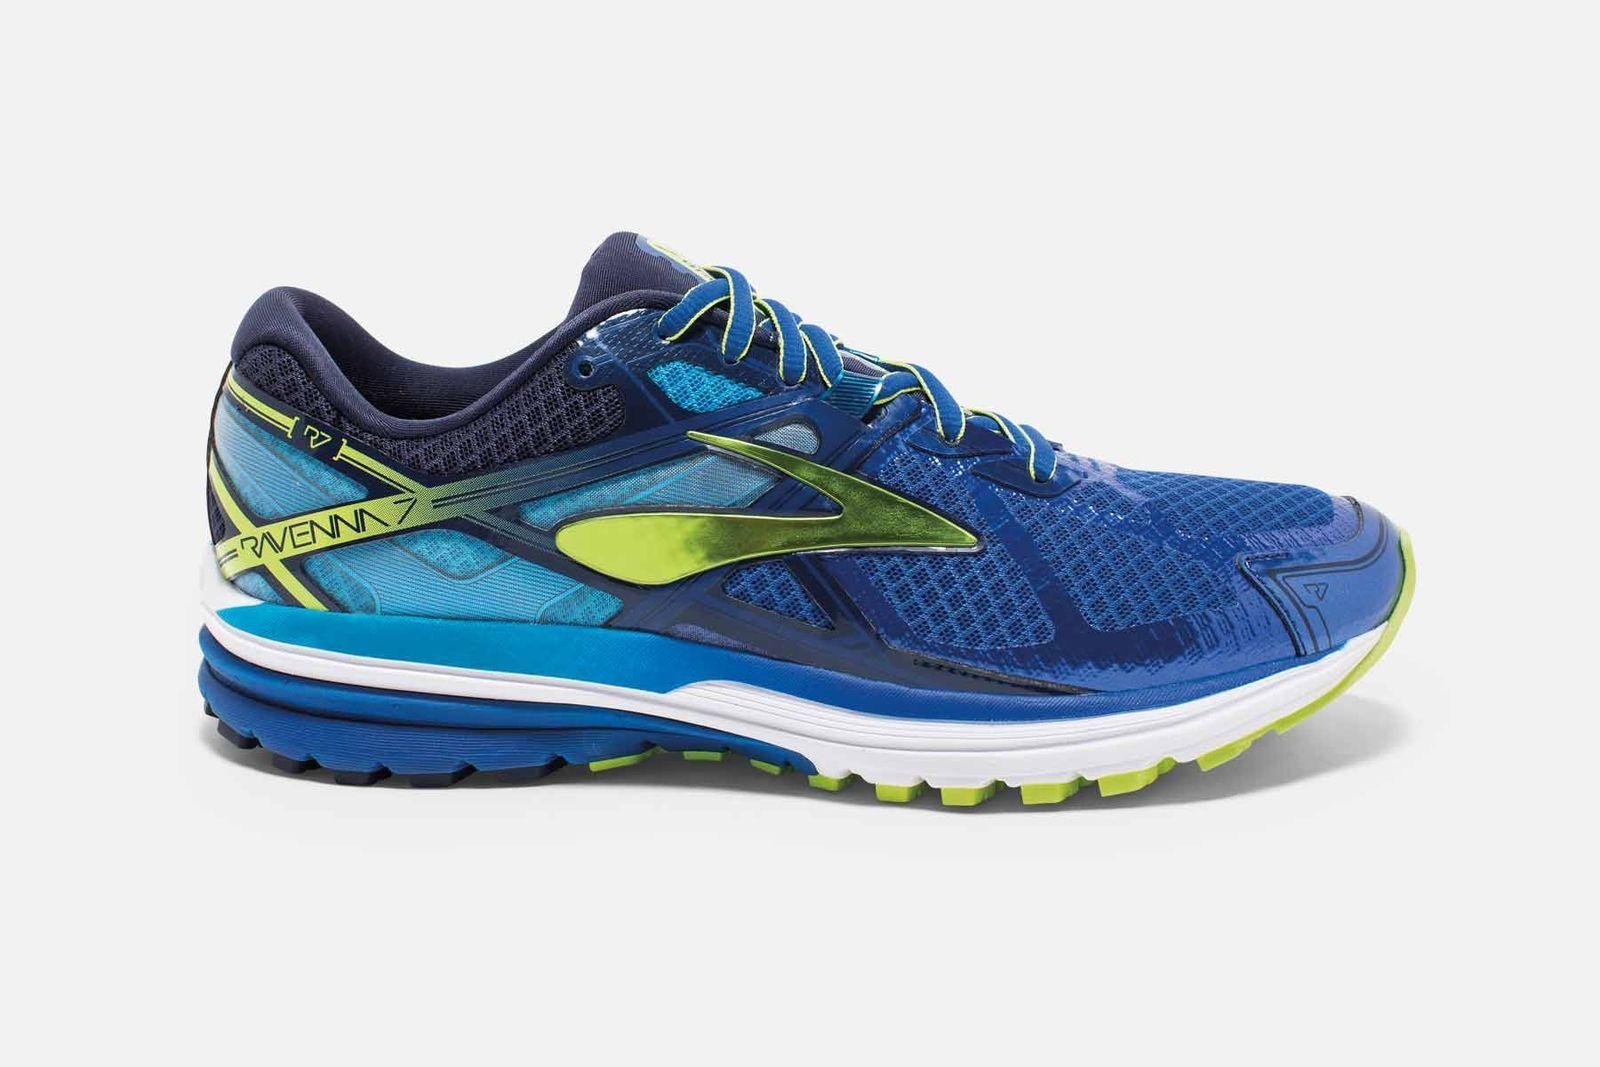 466e3c9229f Brooks Running Men s Ravenna 7 Shoe https   uxshops.com buy